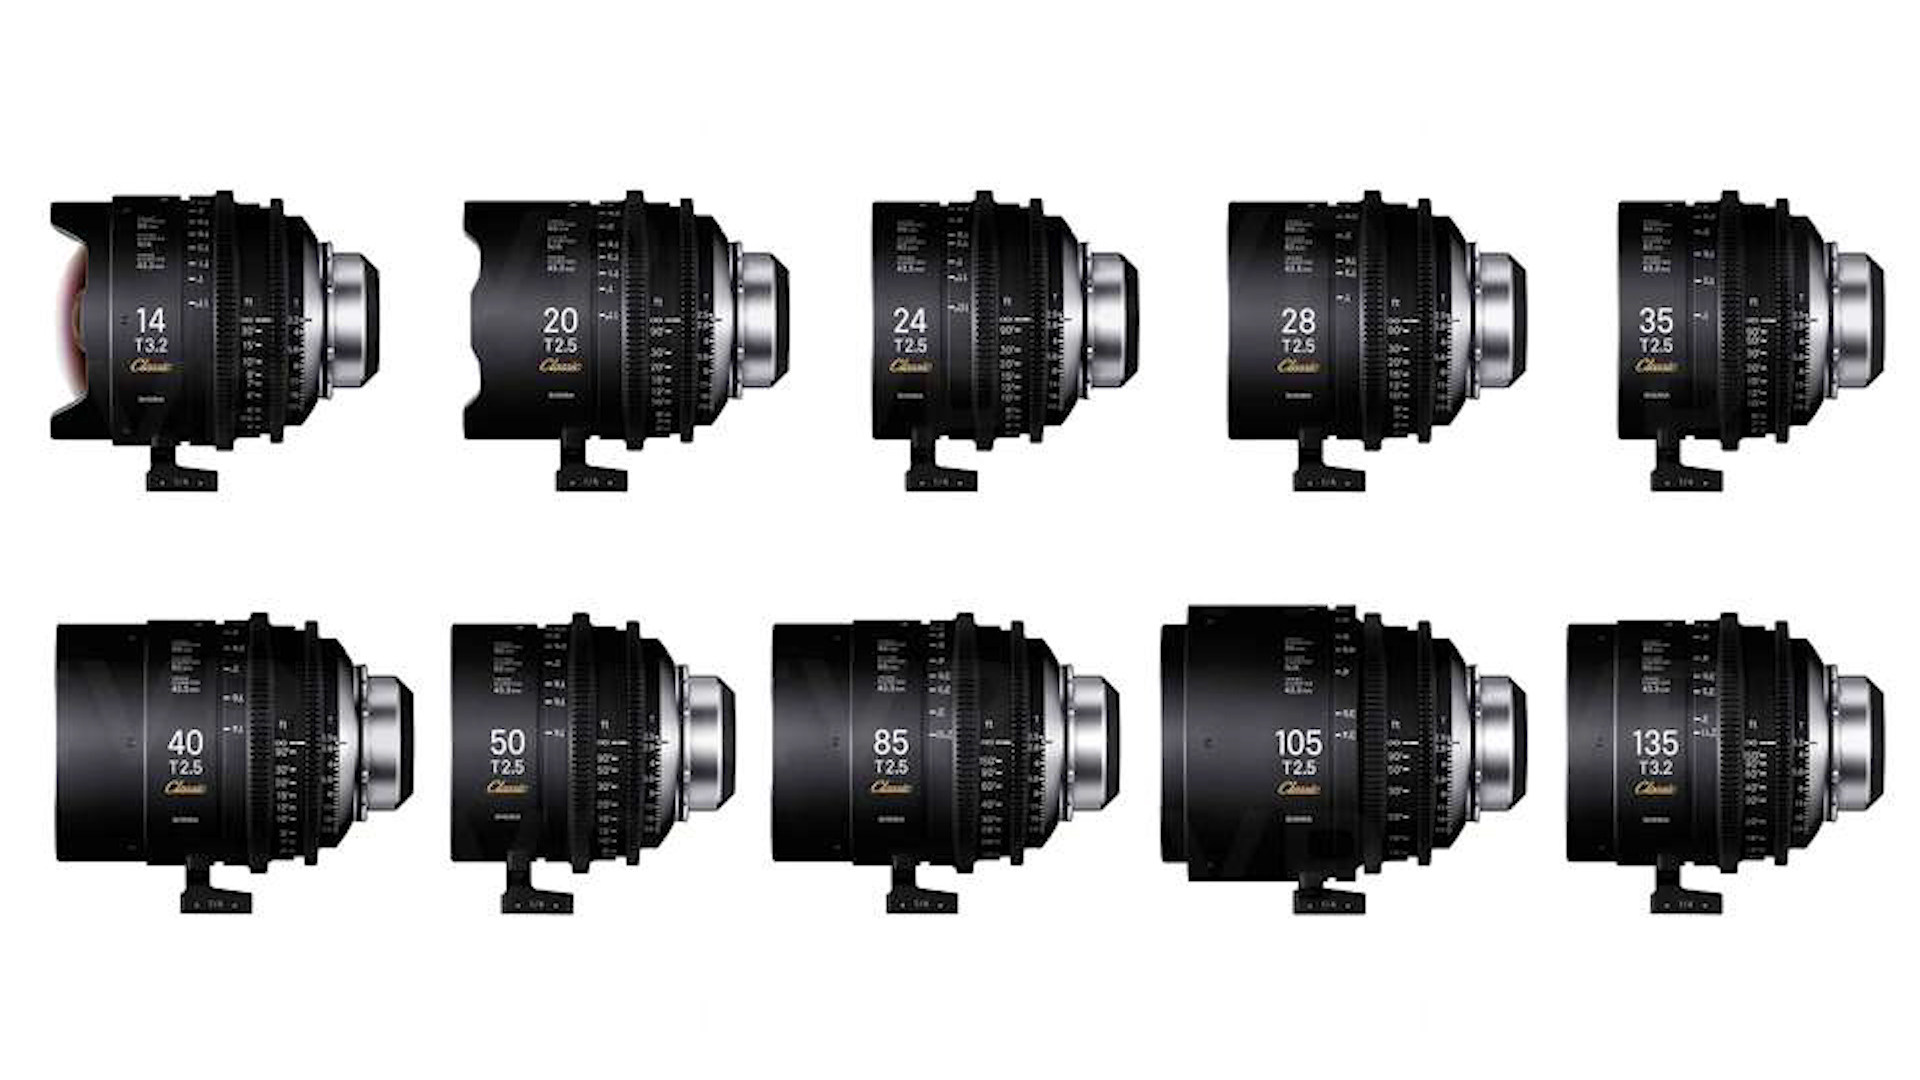 Anuncian el precio del set de lentes SIGMA Classic Prime 10